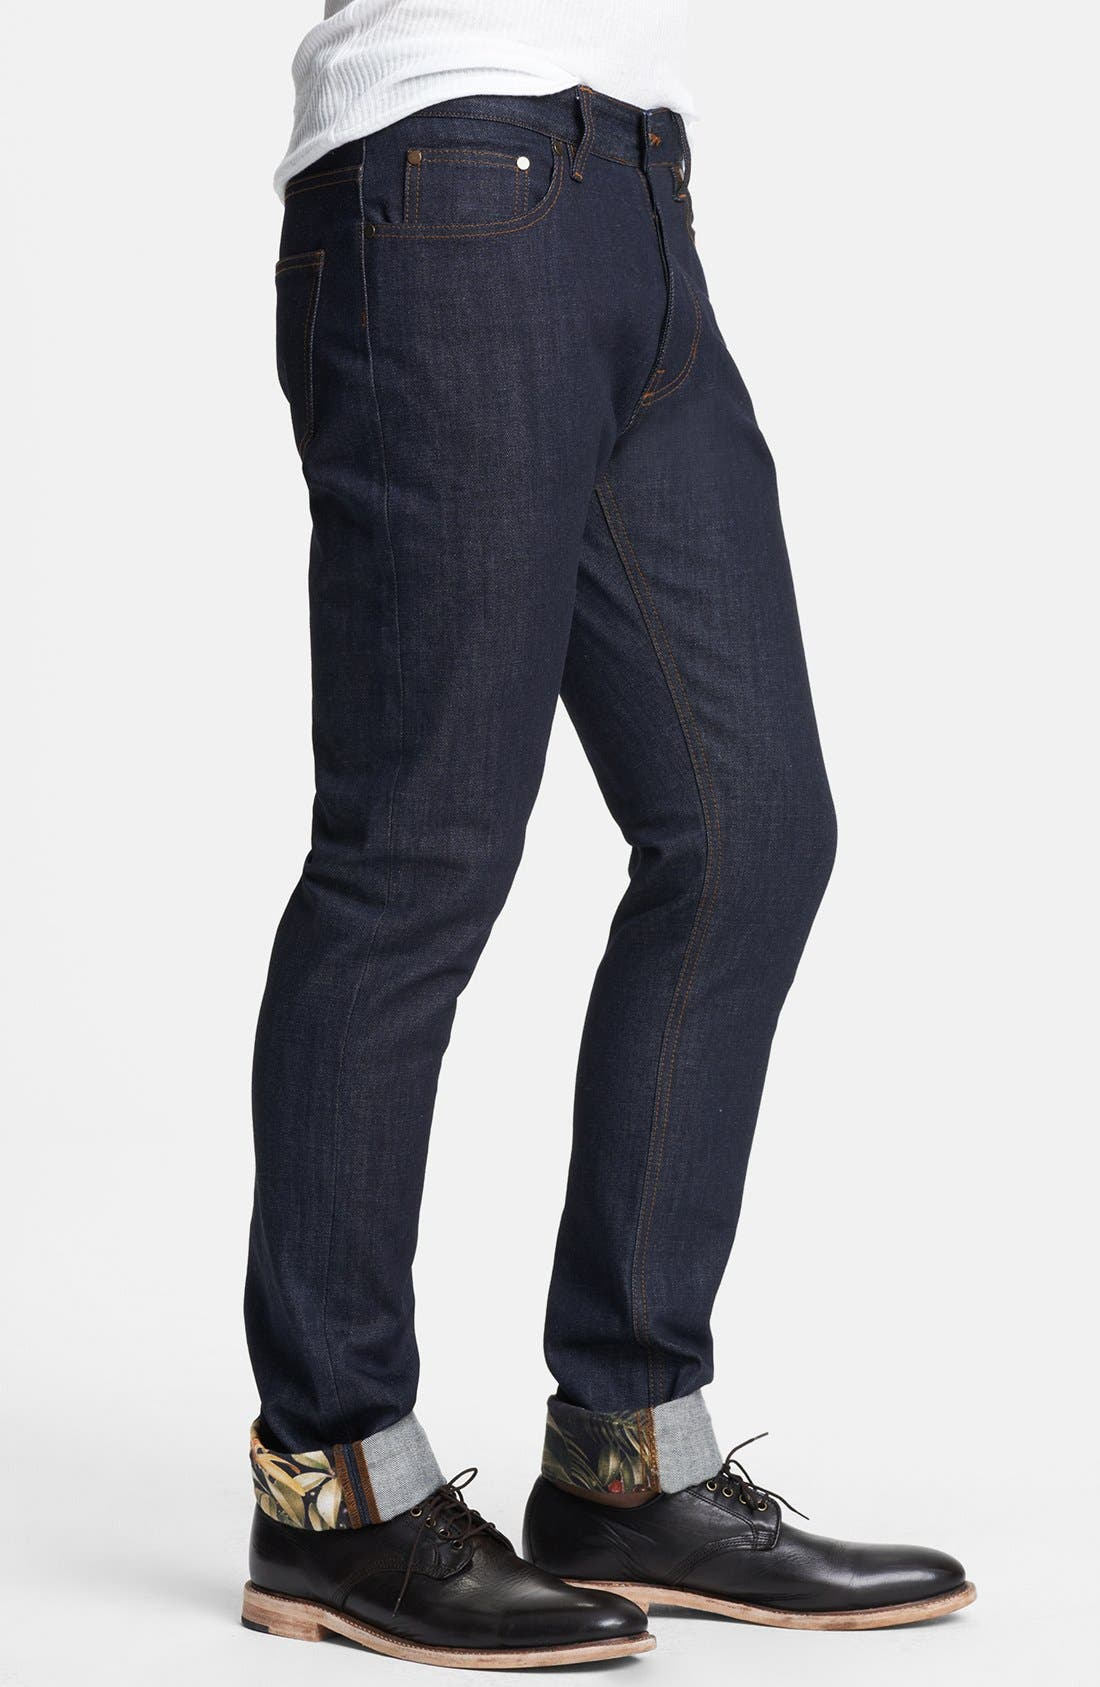 Alternate Image 3  - AMI Alexandre Mattiussi Straight Leg Raw Selvedge Jeans with Floral Cuff Trim (Indigo)